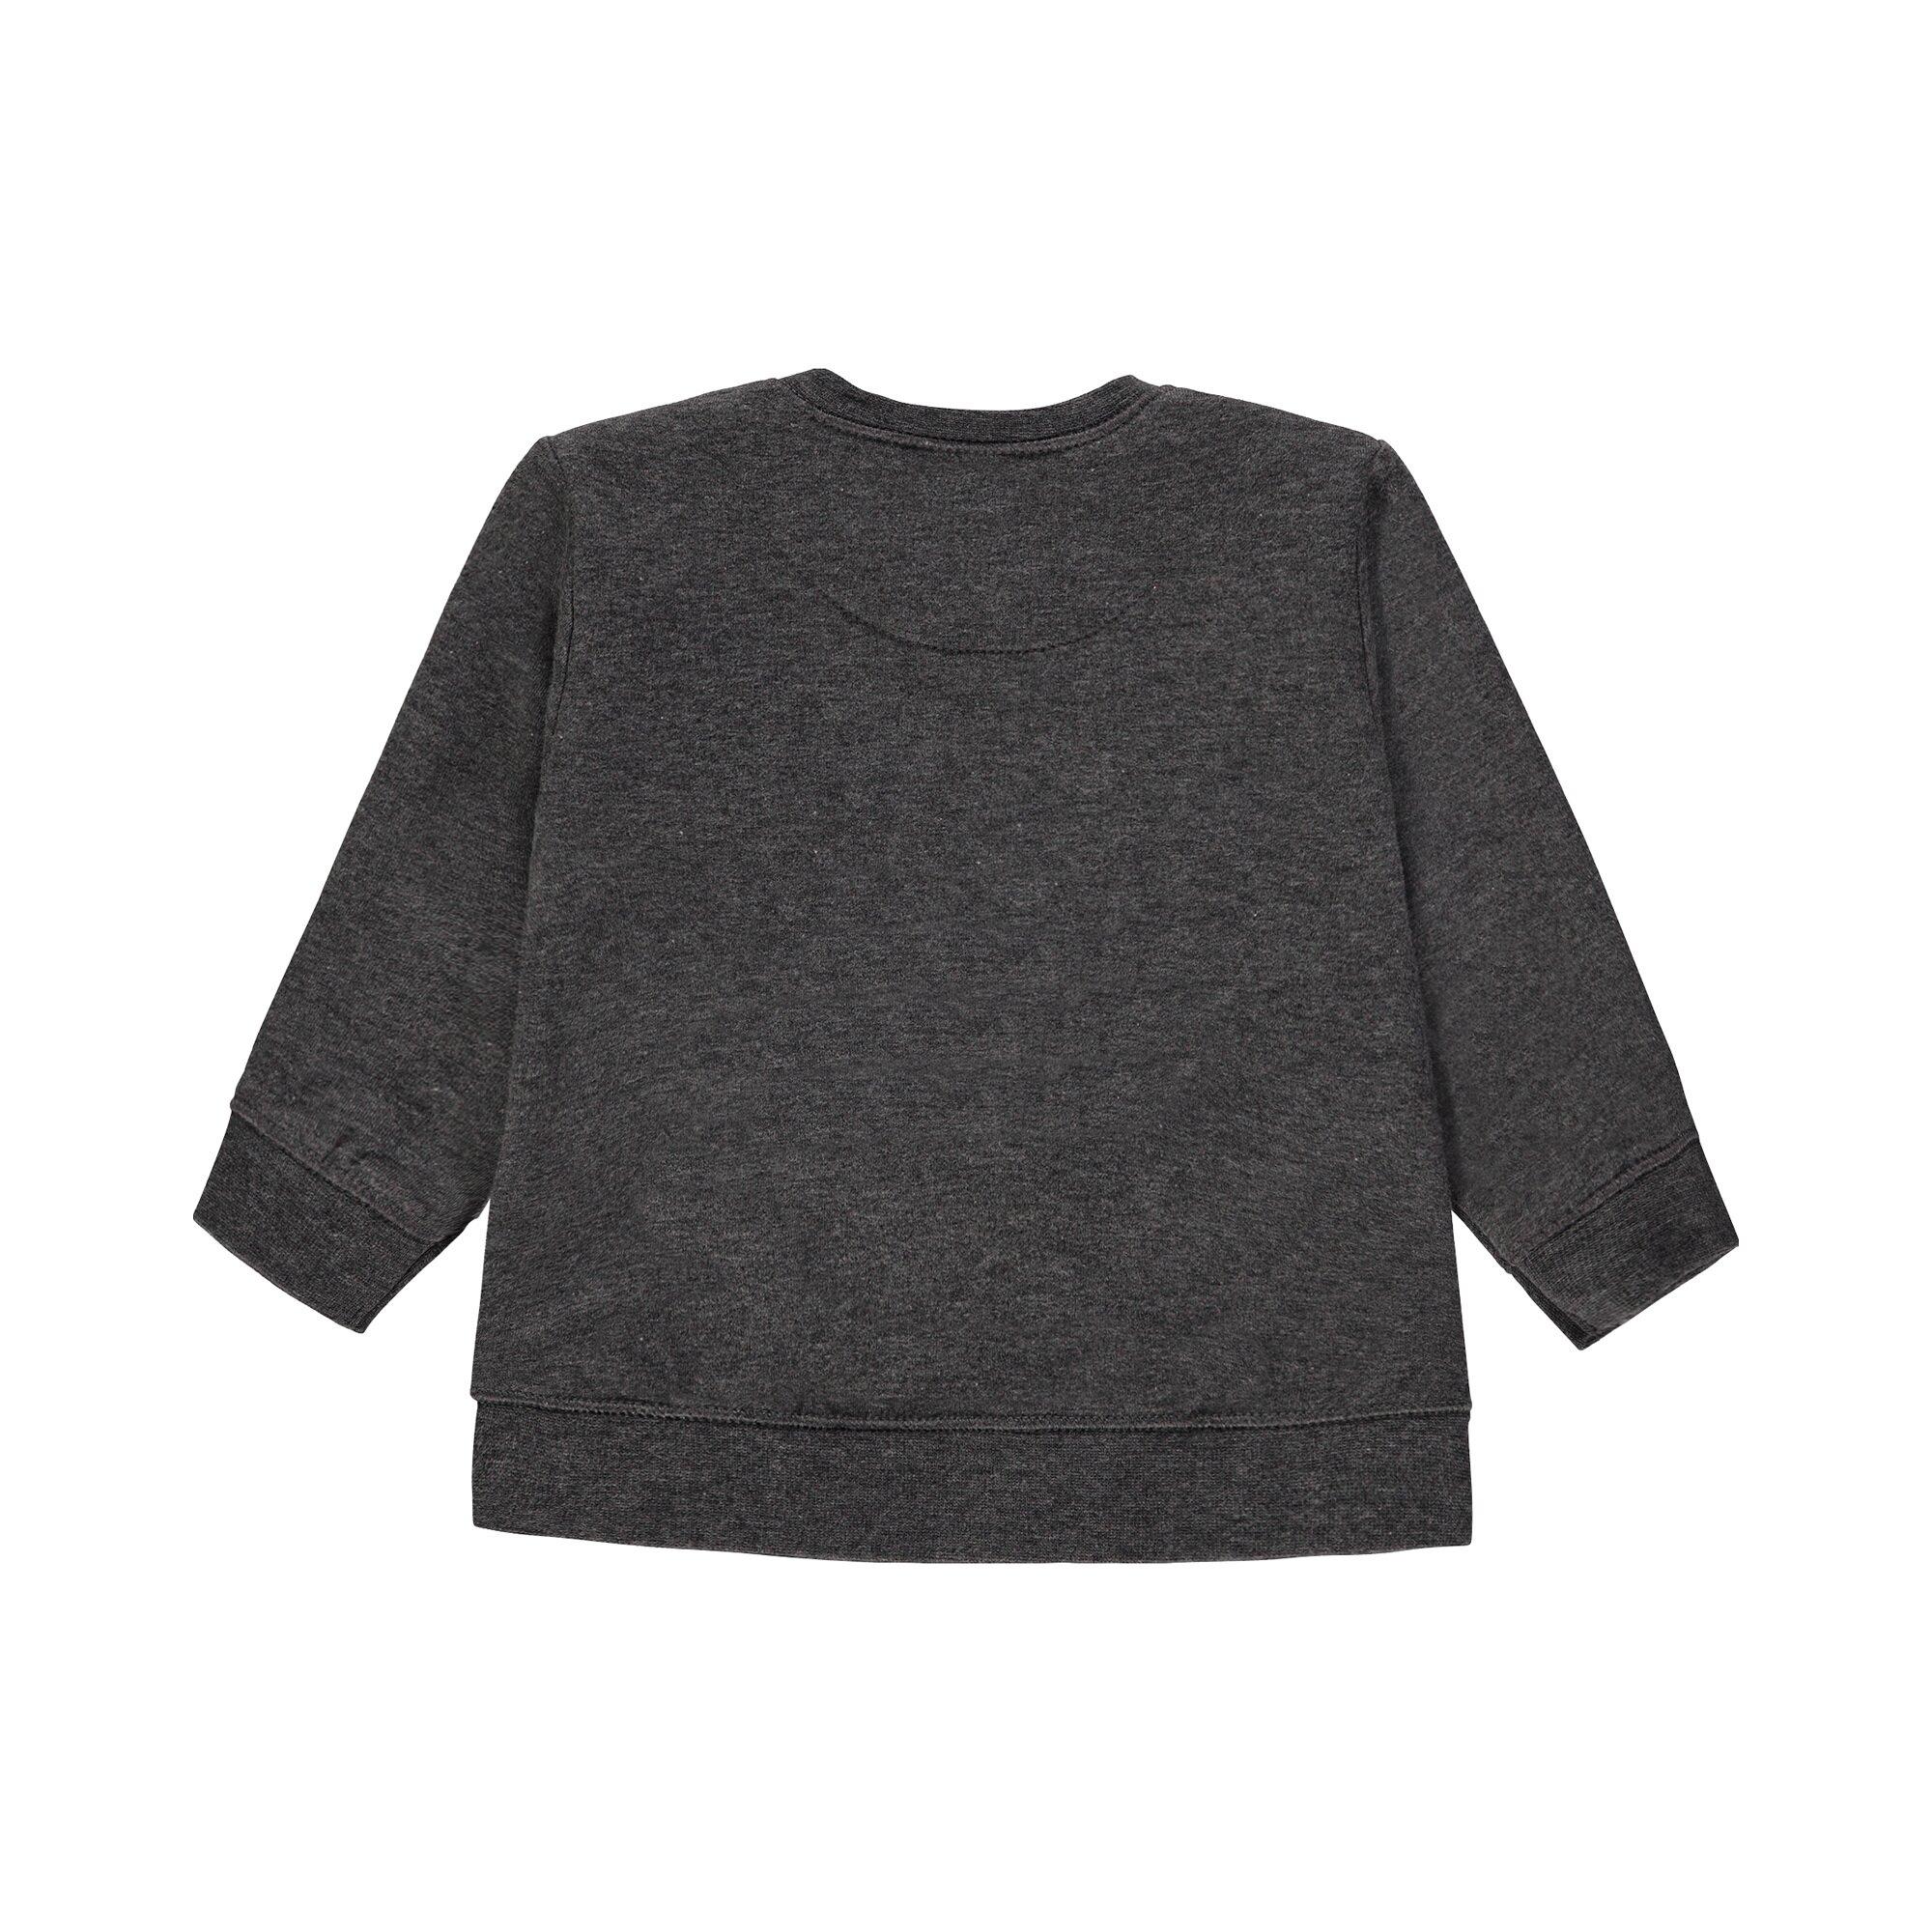 bellybutton-sweatshirt-smiley